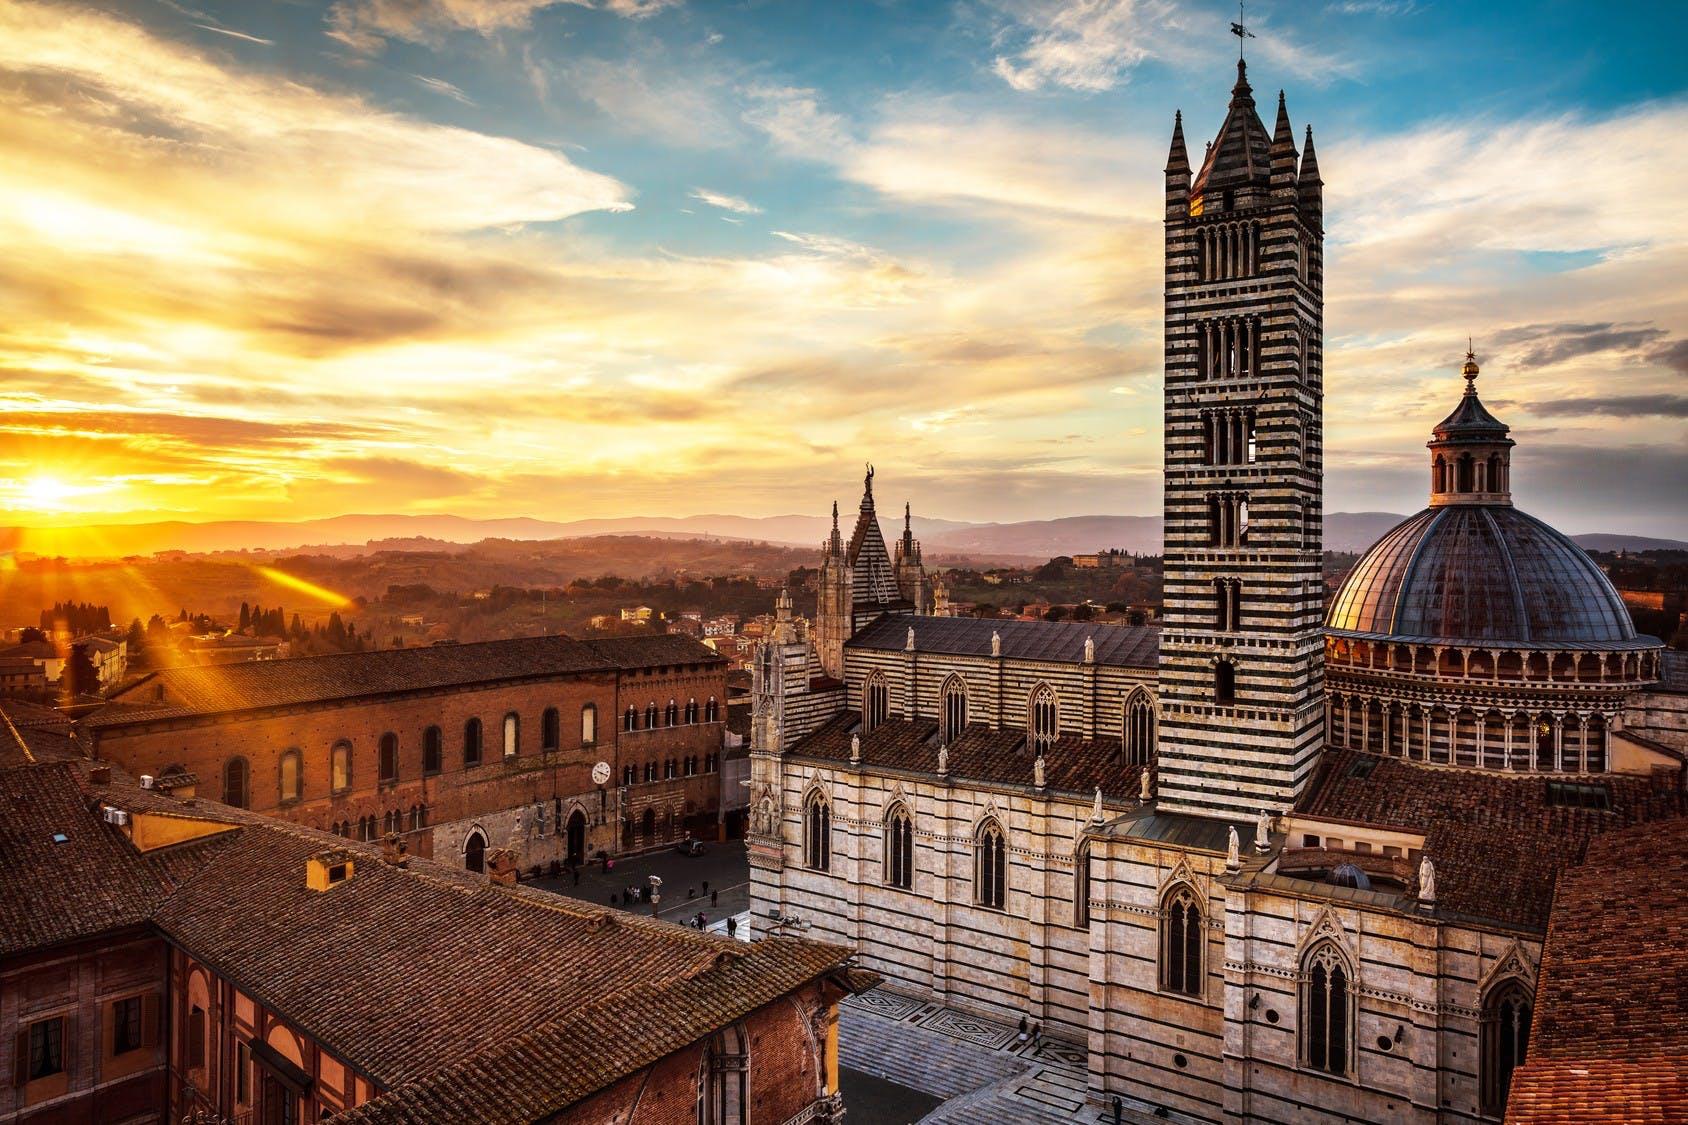 Siena cathedral view_Fotolia.jpg